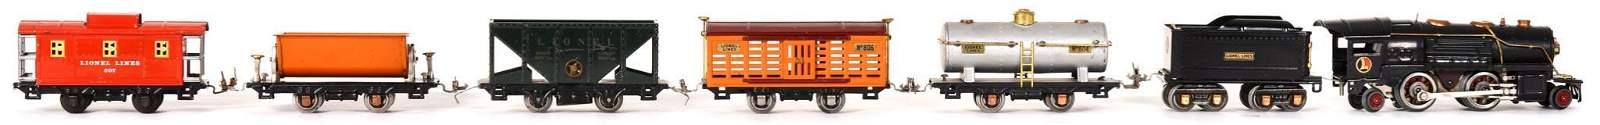 Lionel O Gauge Steam Engine Model #259E (type 1)